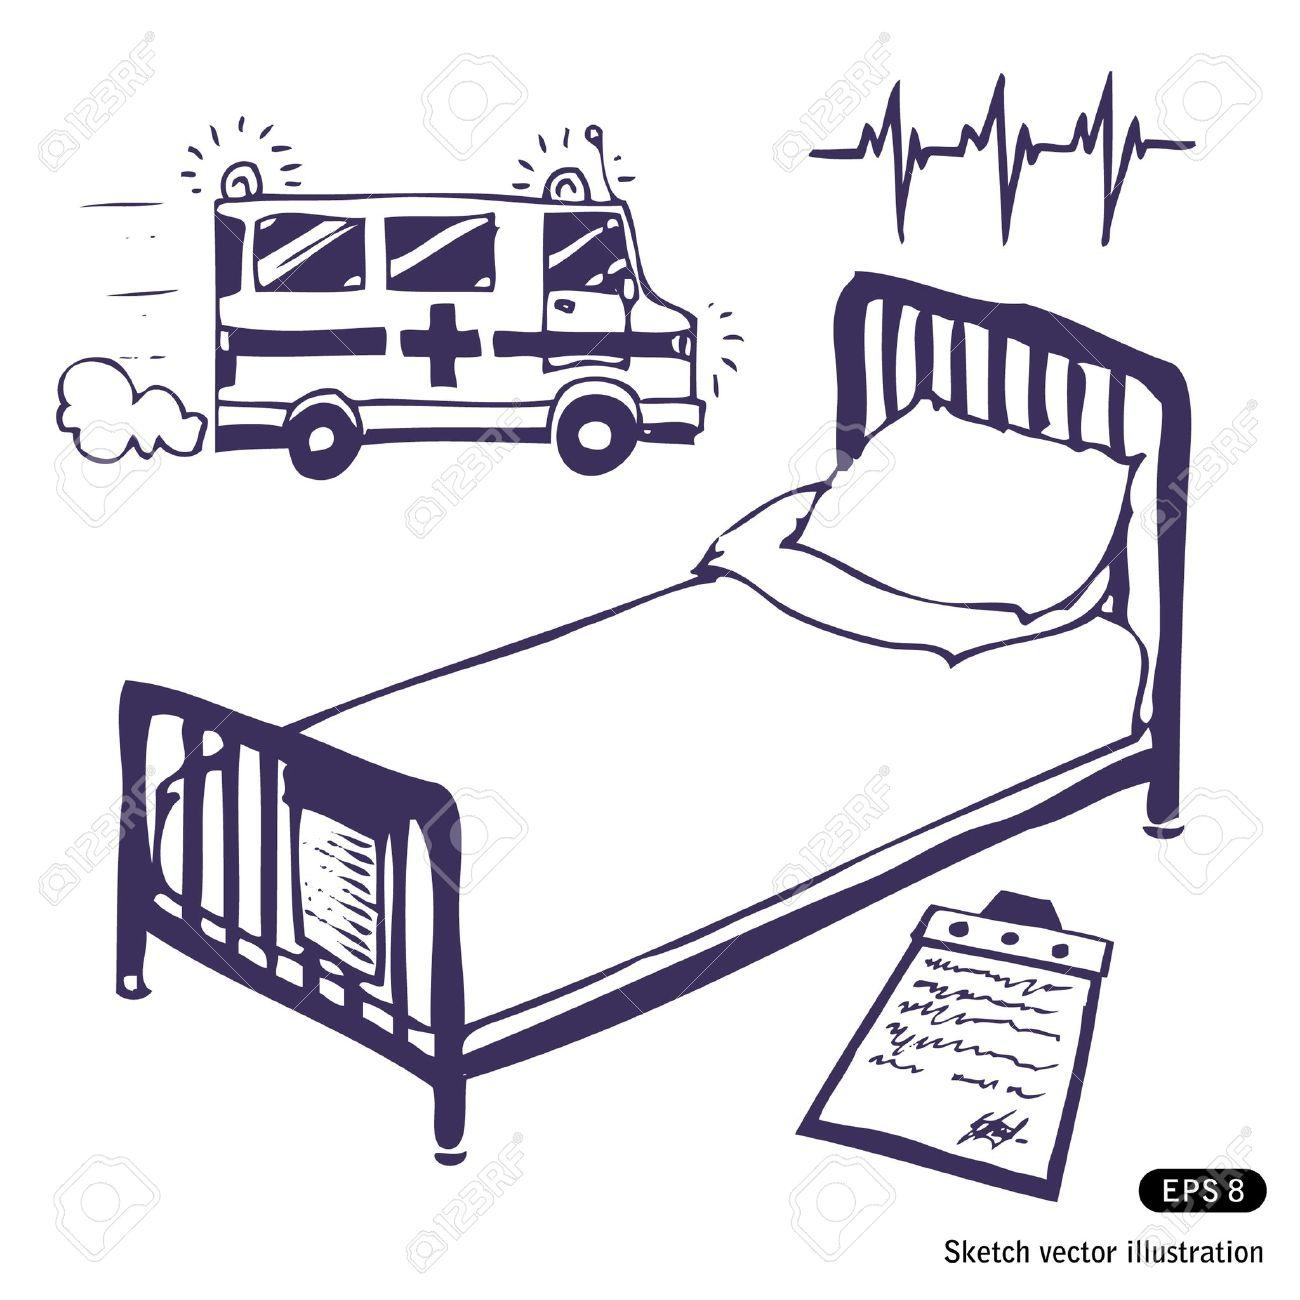 1300x1300 Hospital Bed And Ambulance. Hand Drawn Illustration On White